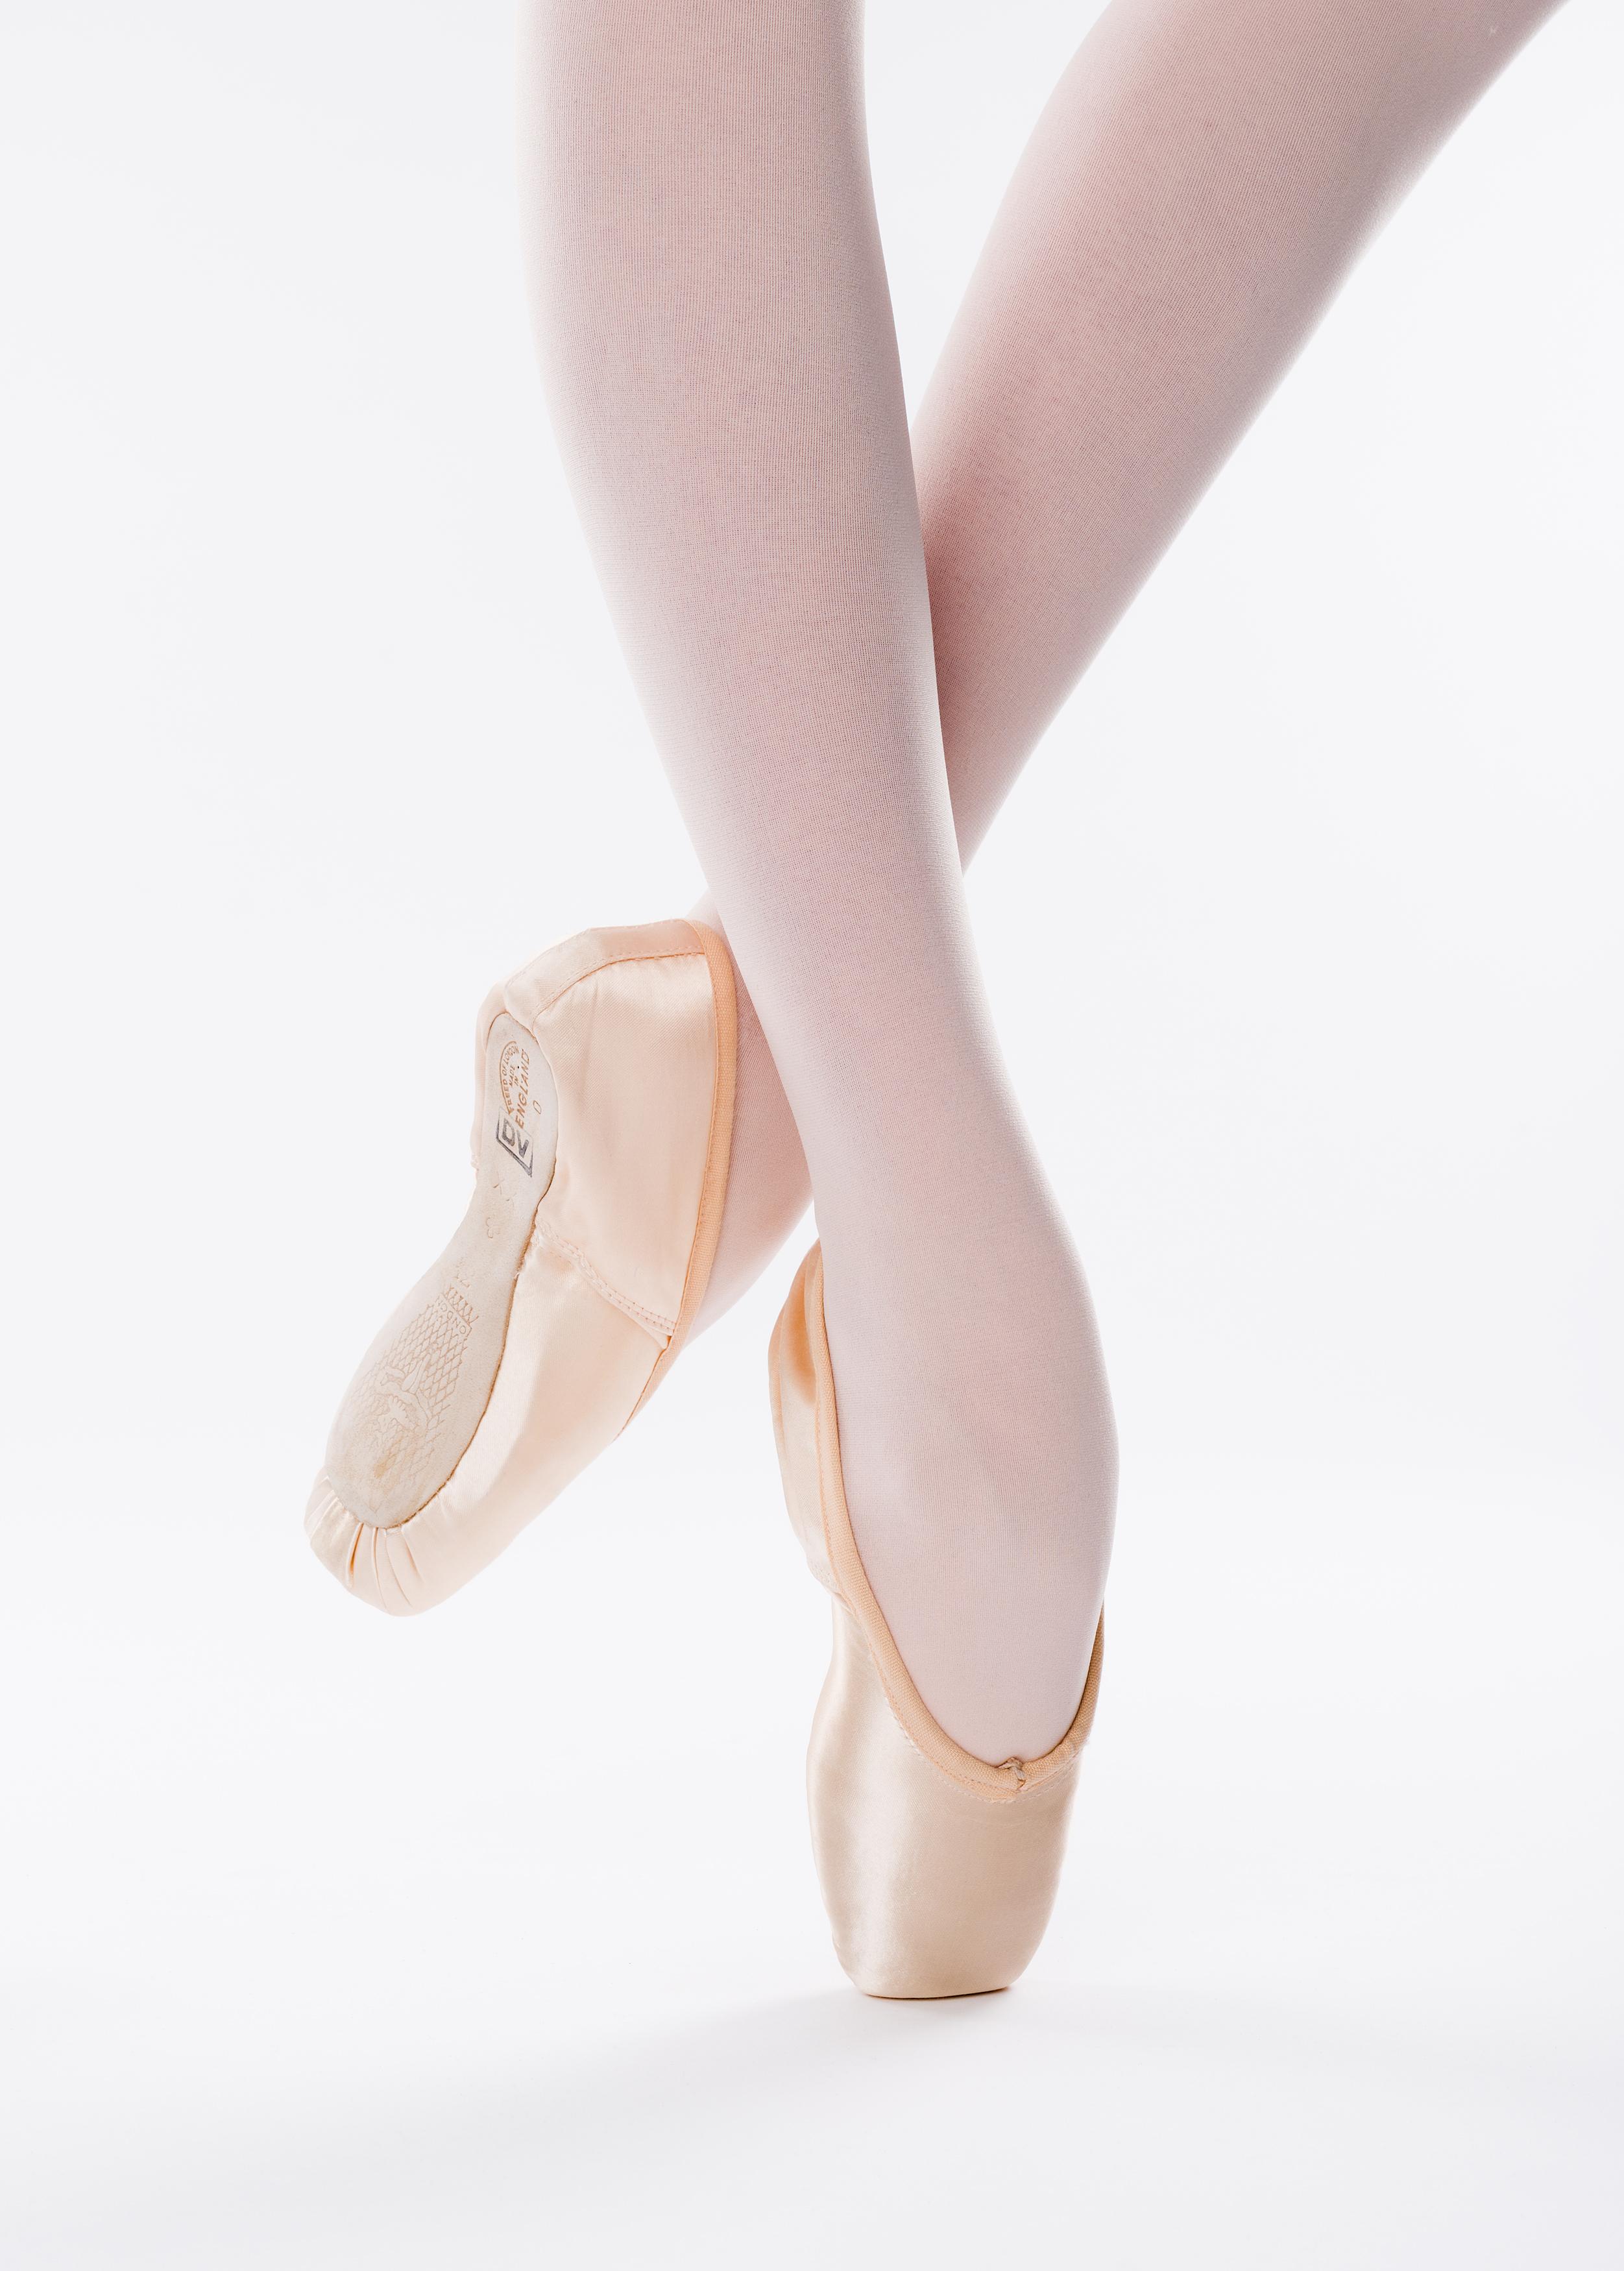 Scarpe da punta Freed : La classica